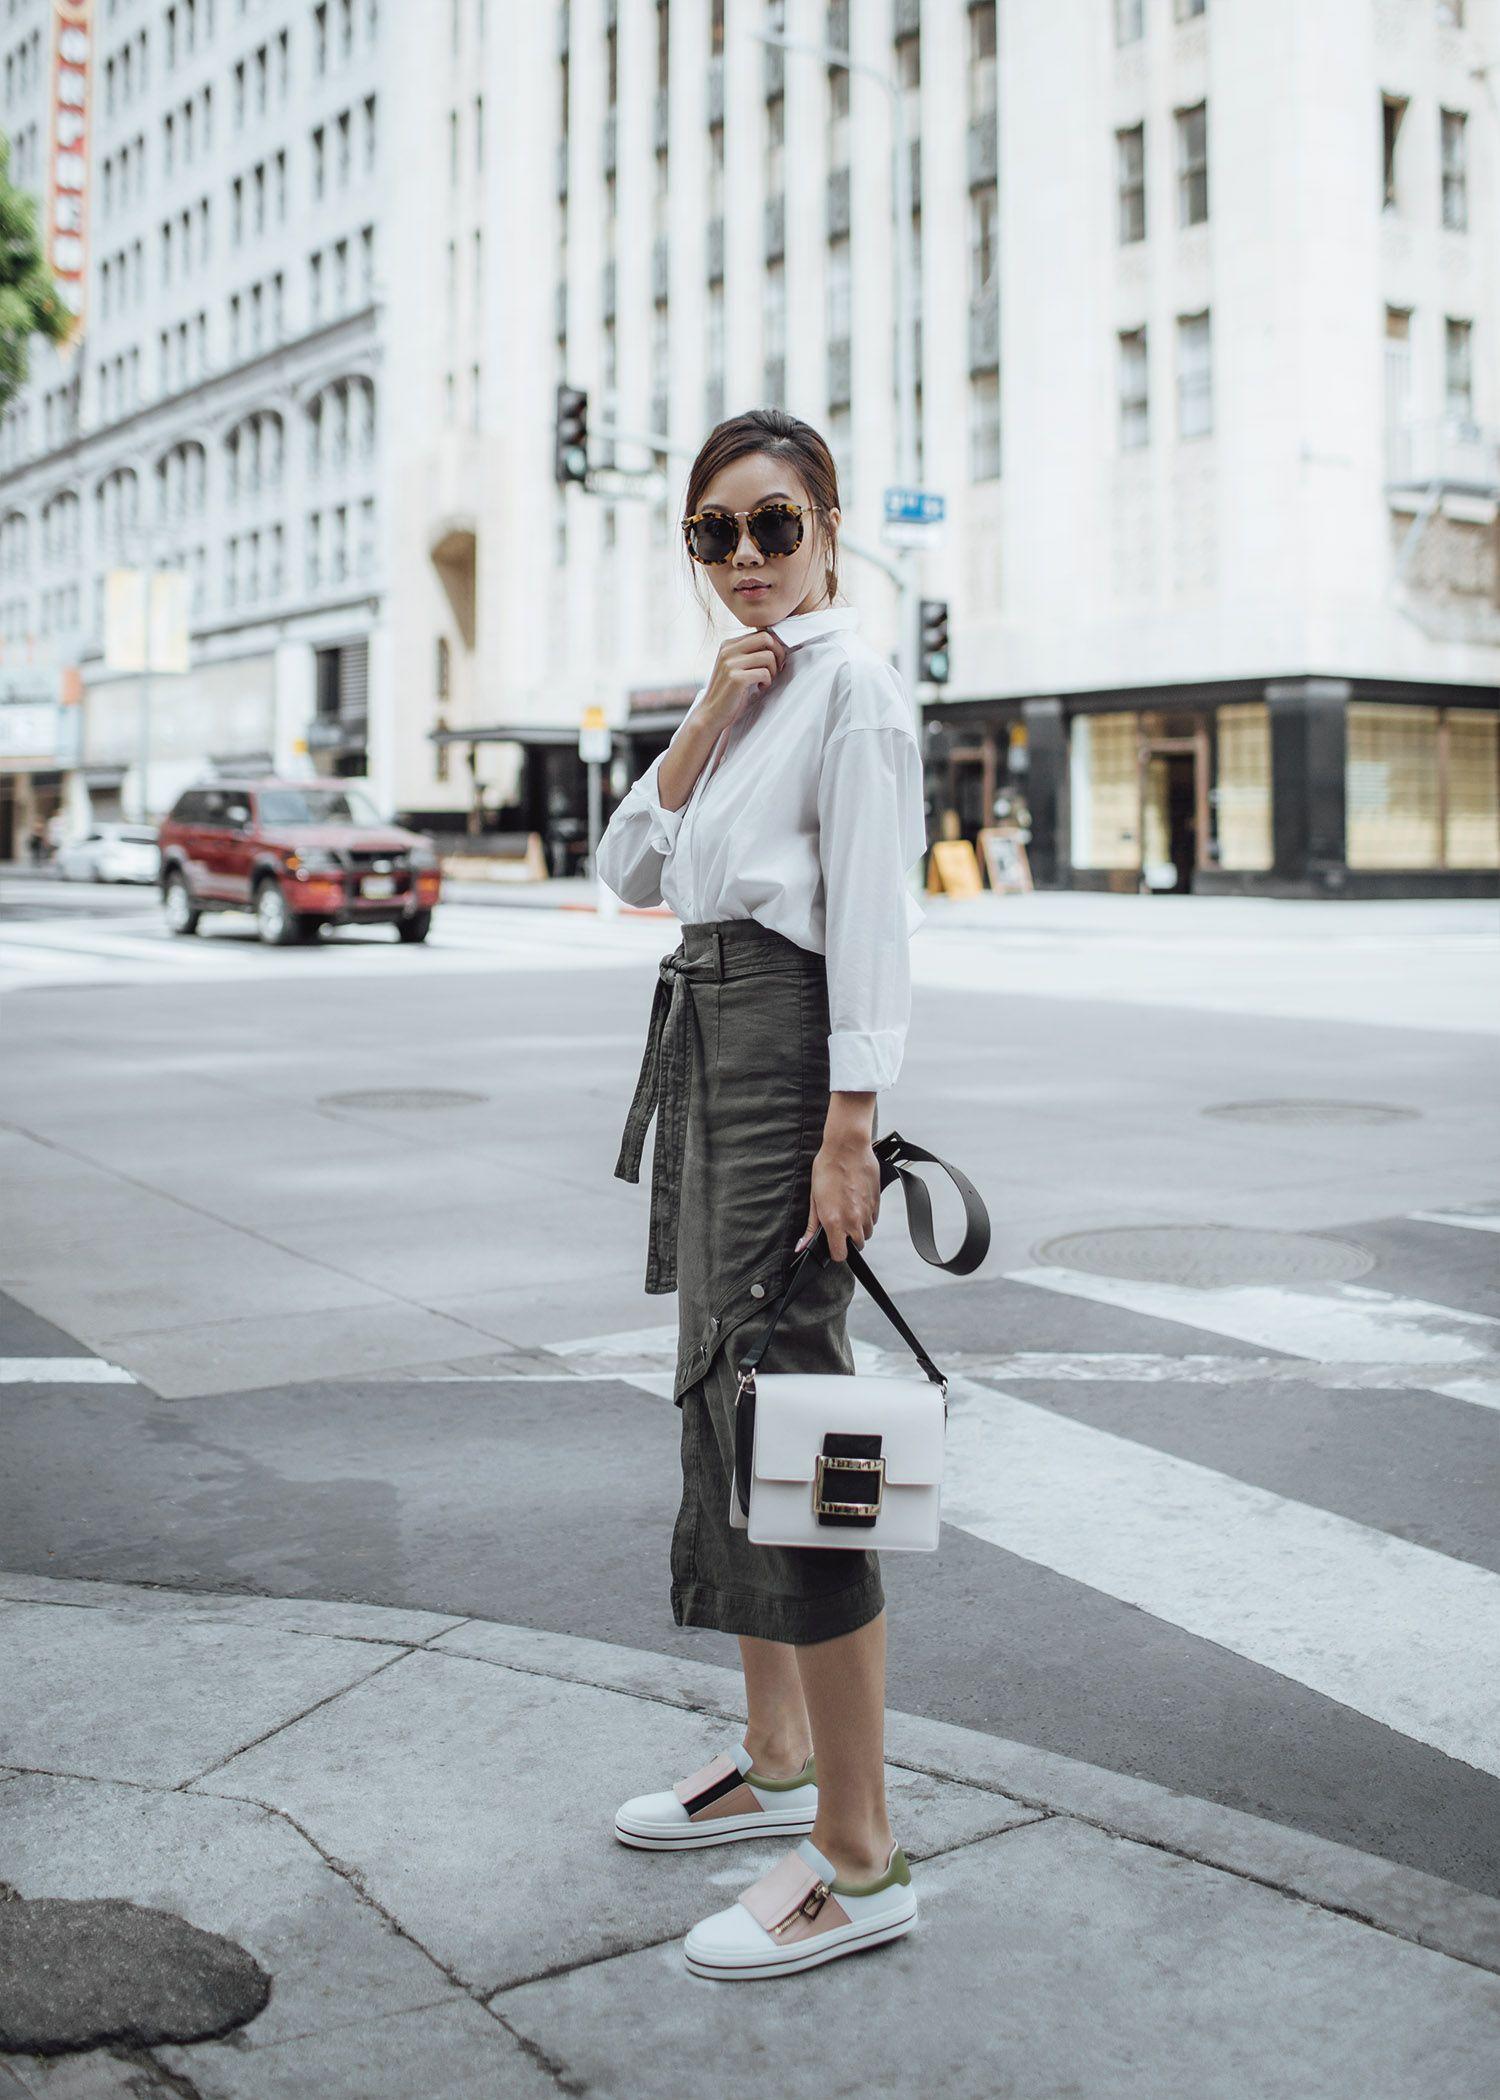 191bac52bc6 Midi skirt outfit Street style fashion blogger influencer Jenny Tsang of Tsangtastic  wearing white button down